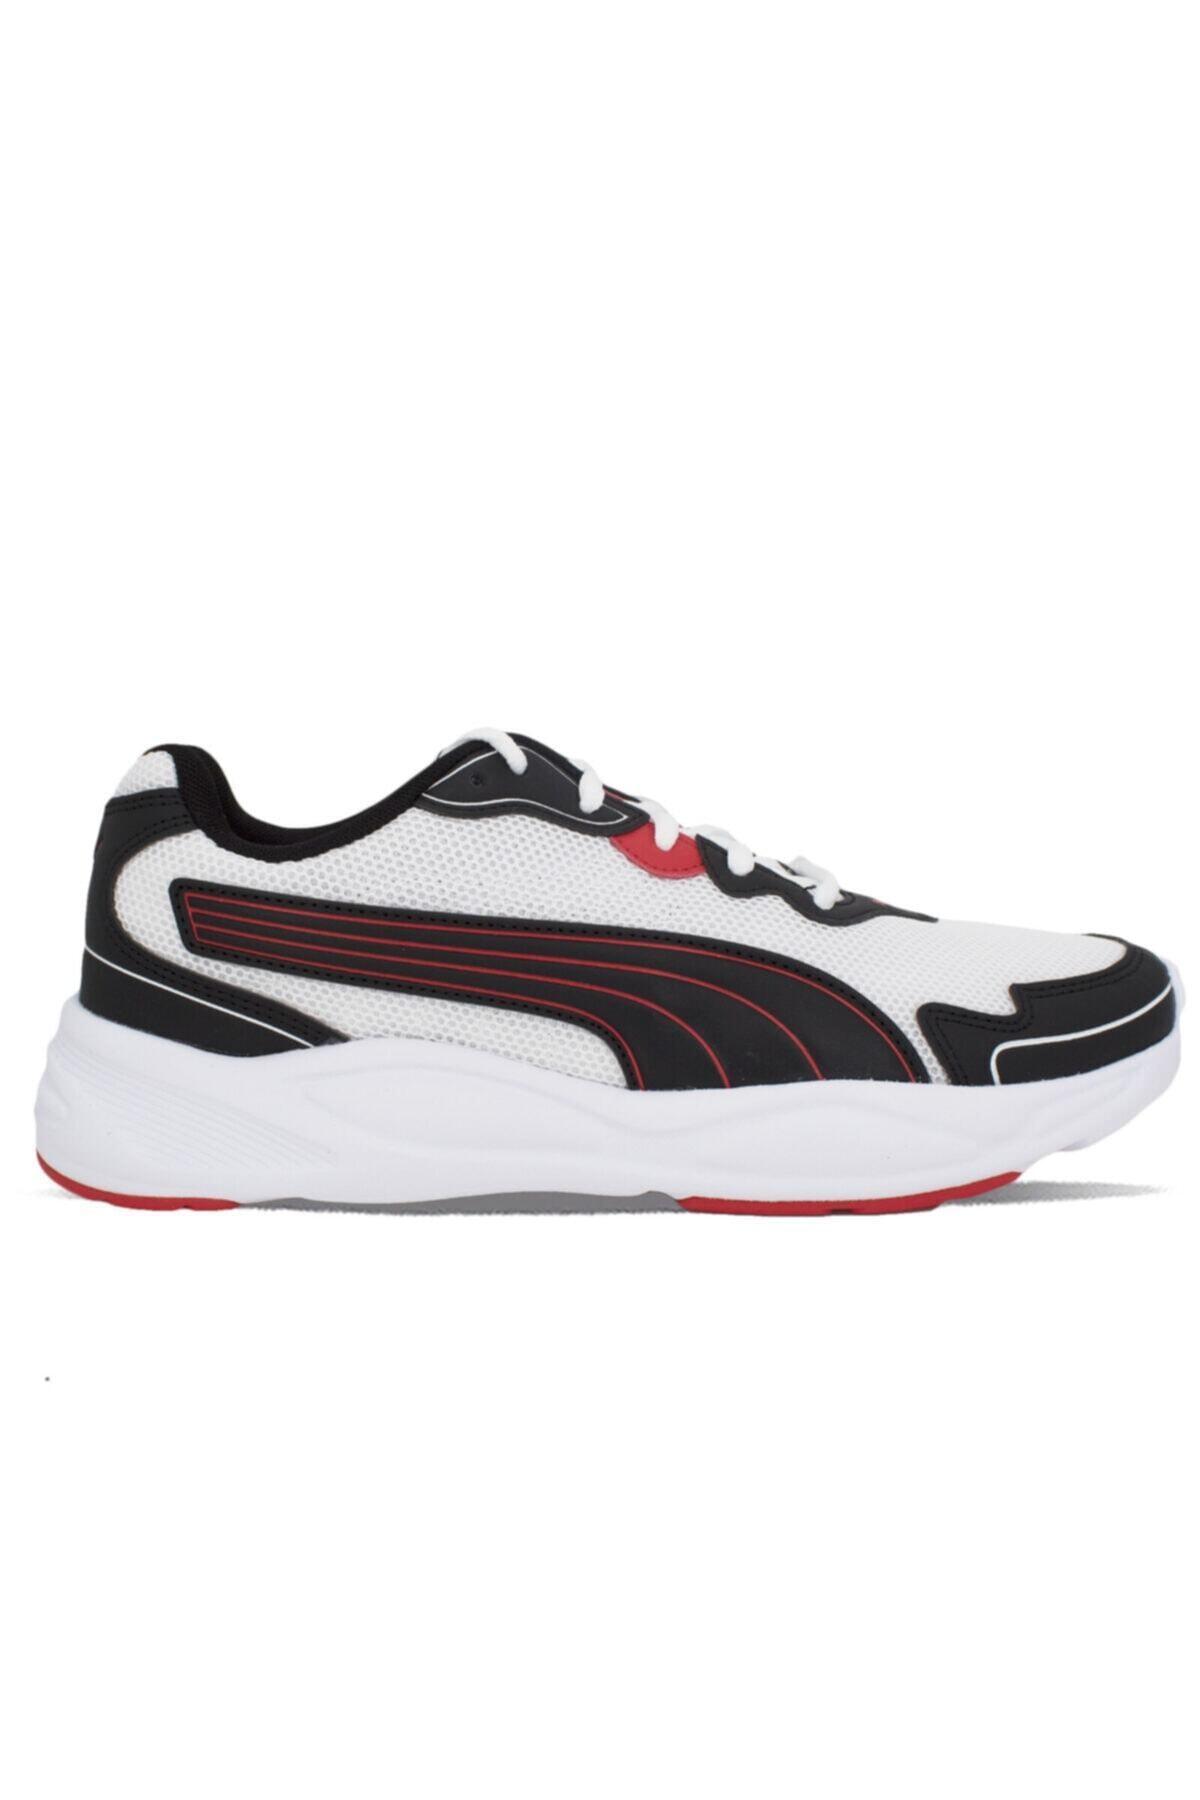 Puma 90S RUNNER NU WAVE Beyaz Erkek Sneaker Ayakkabı 100651392 1